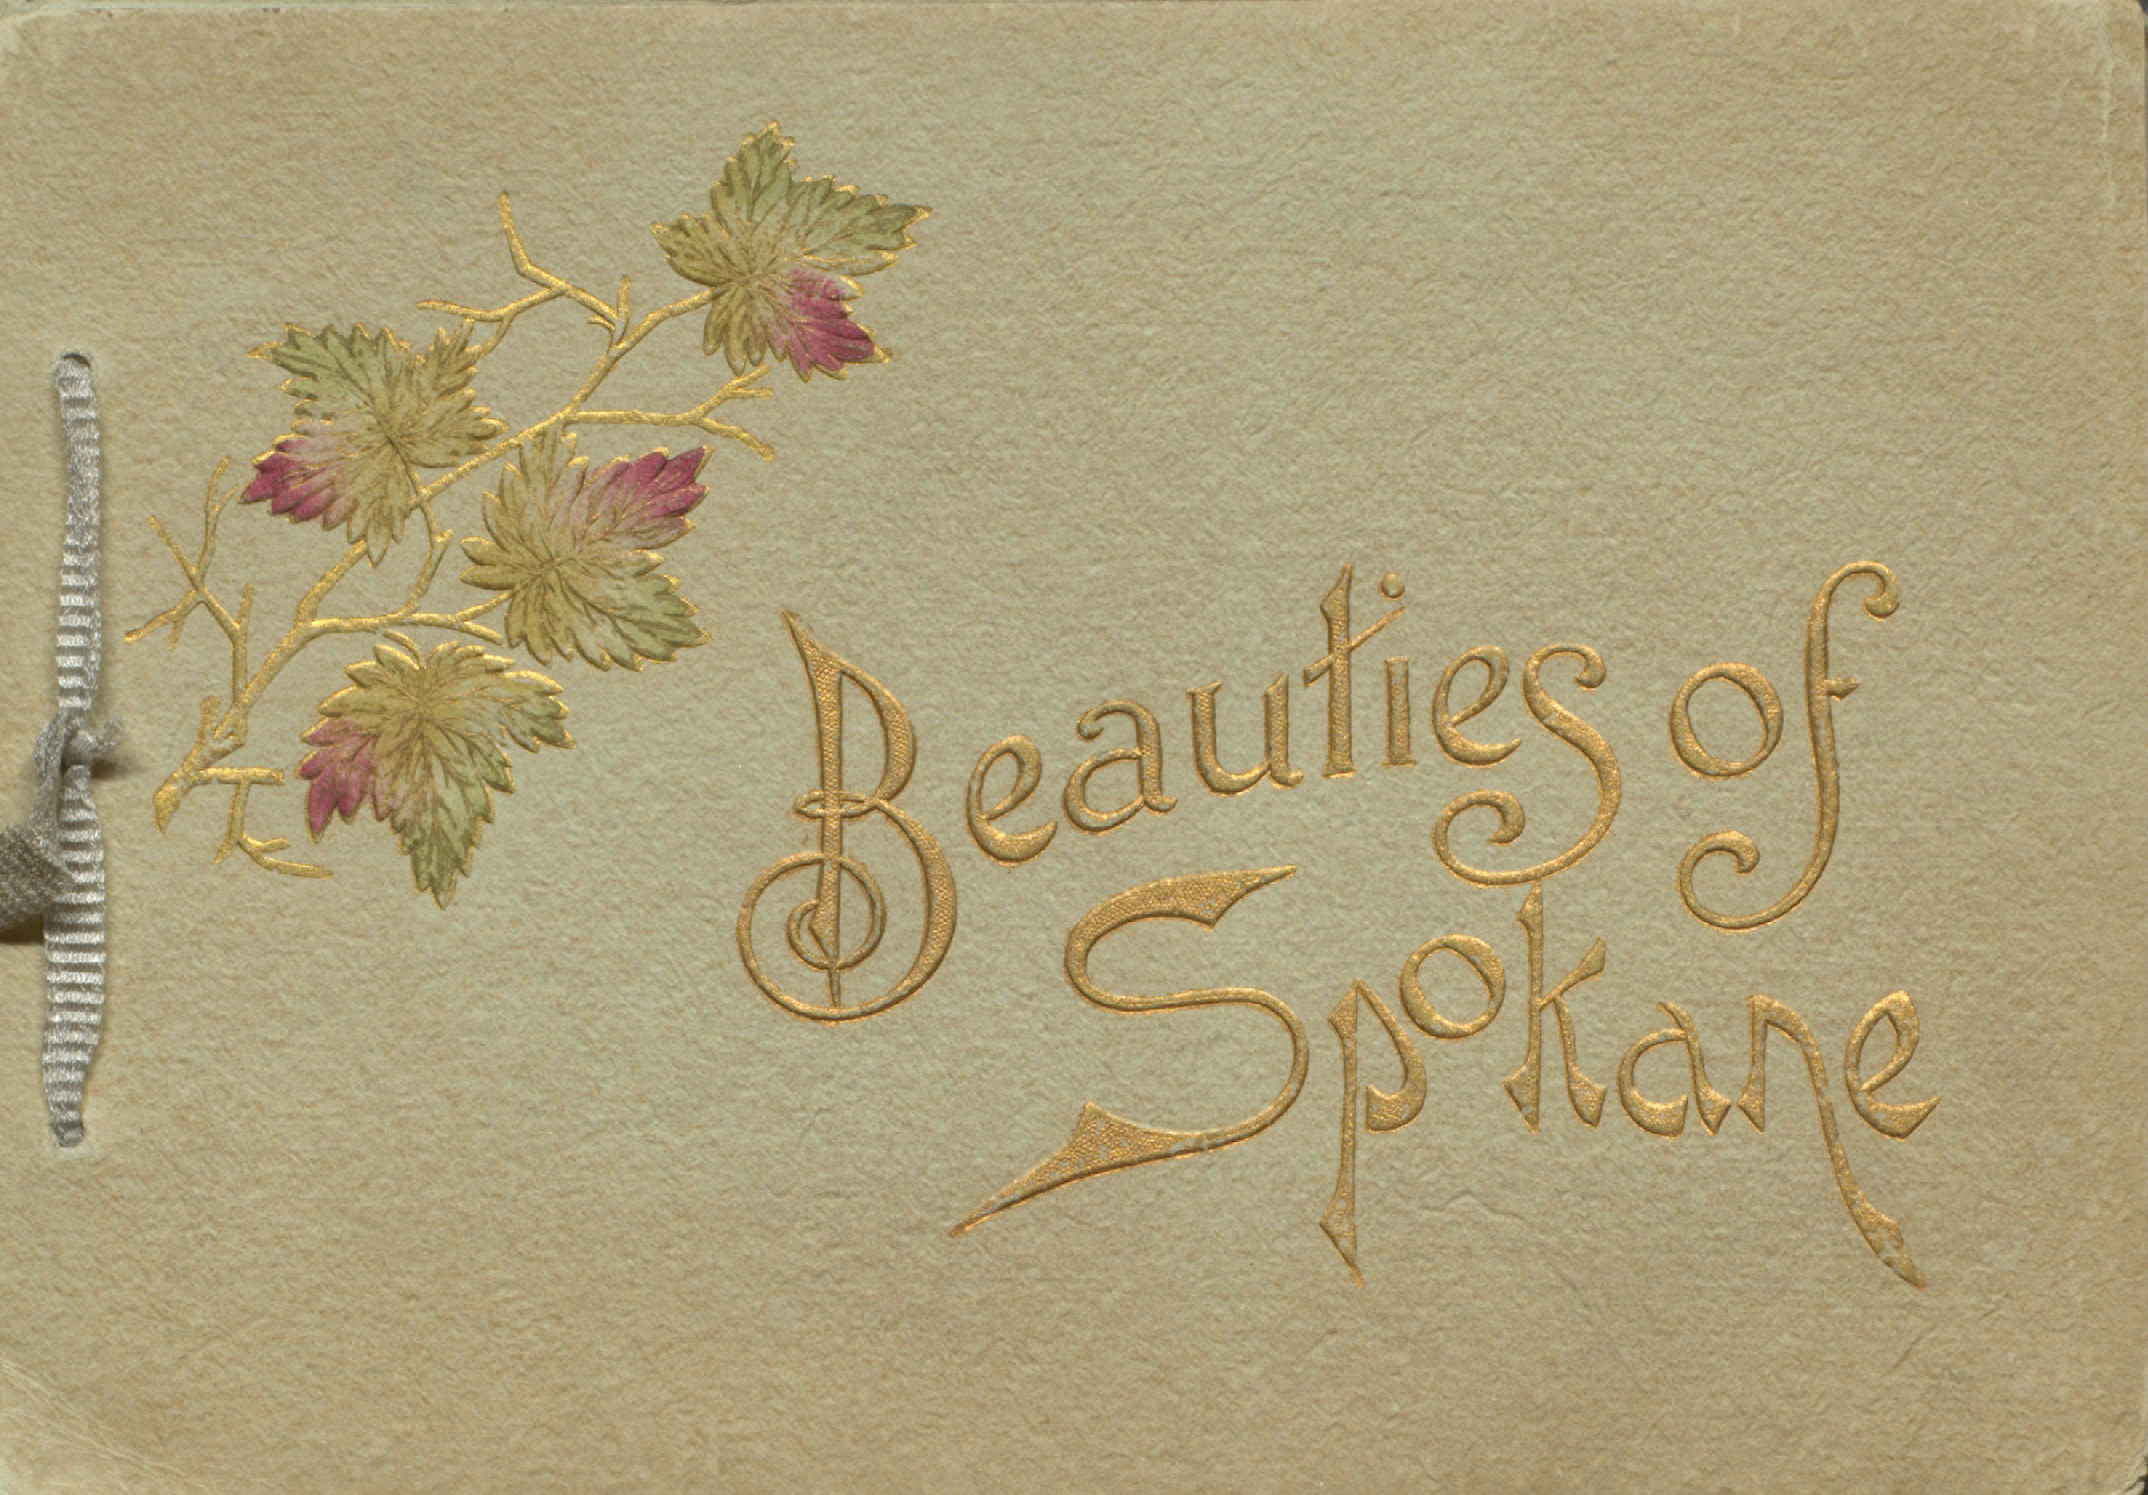 Beauties of Spokane. Cover.